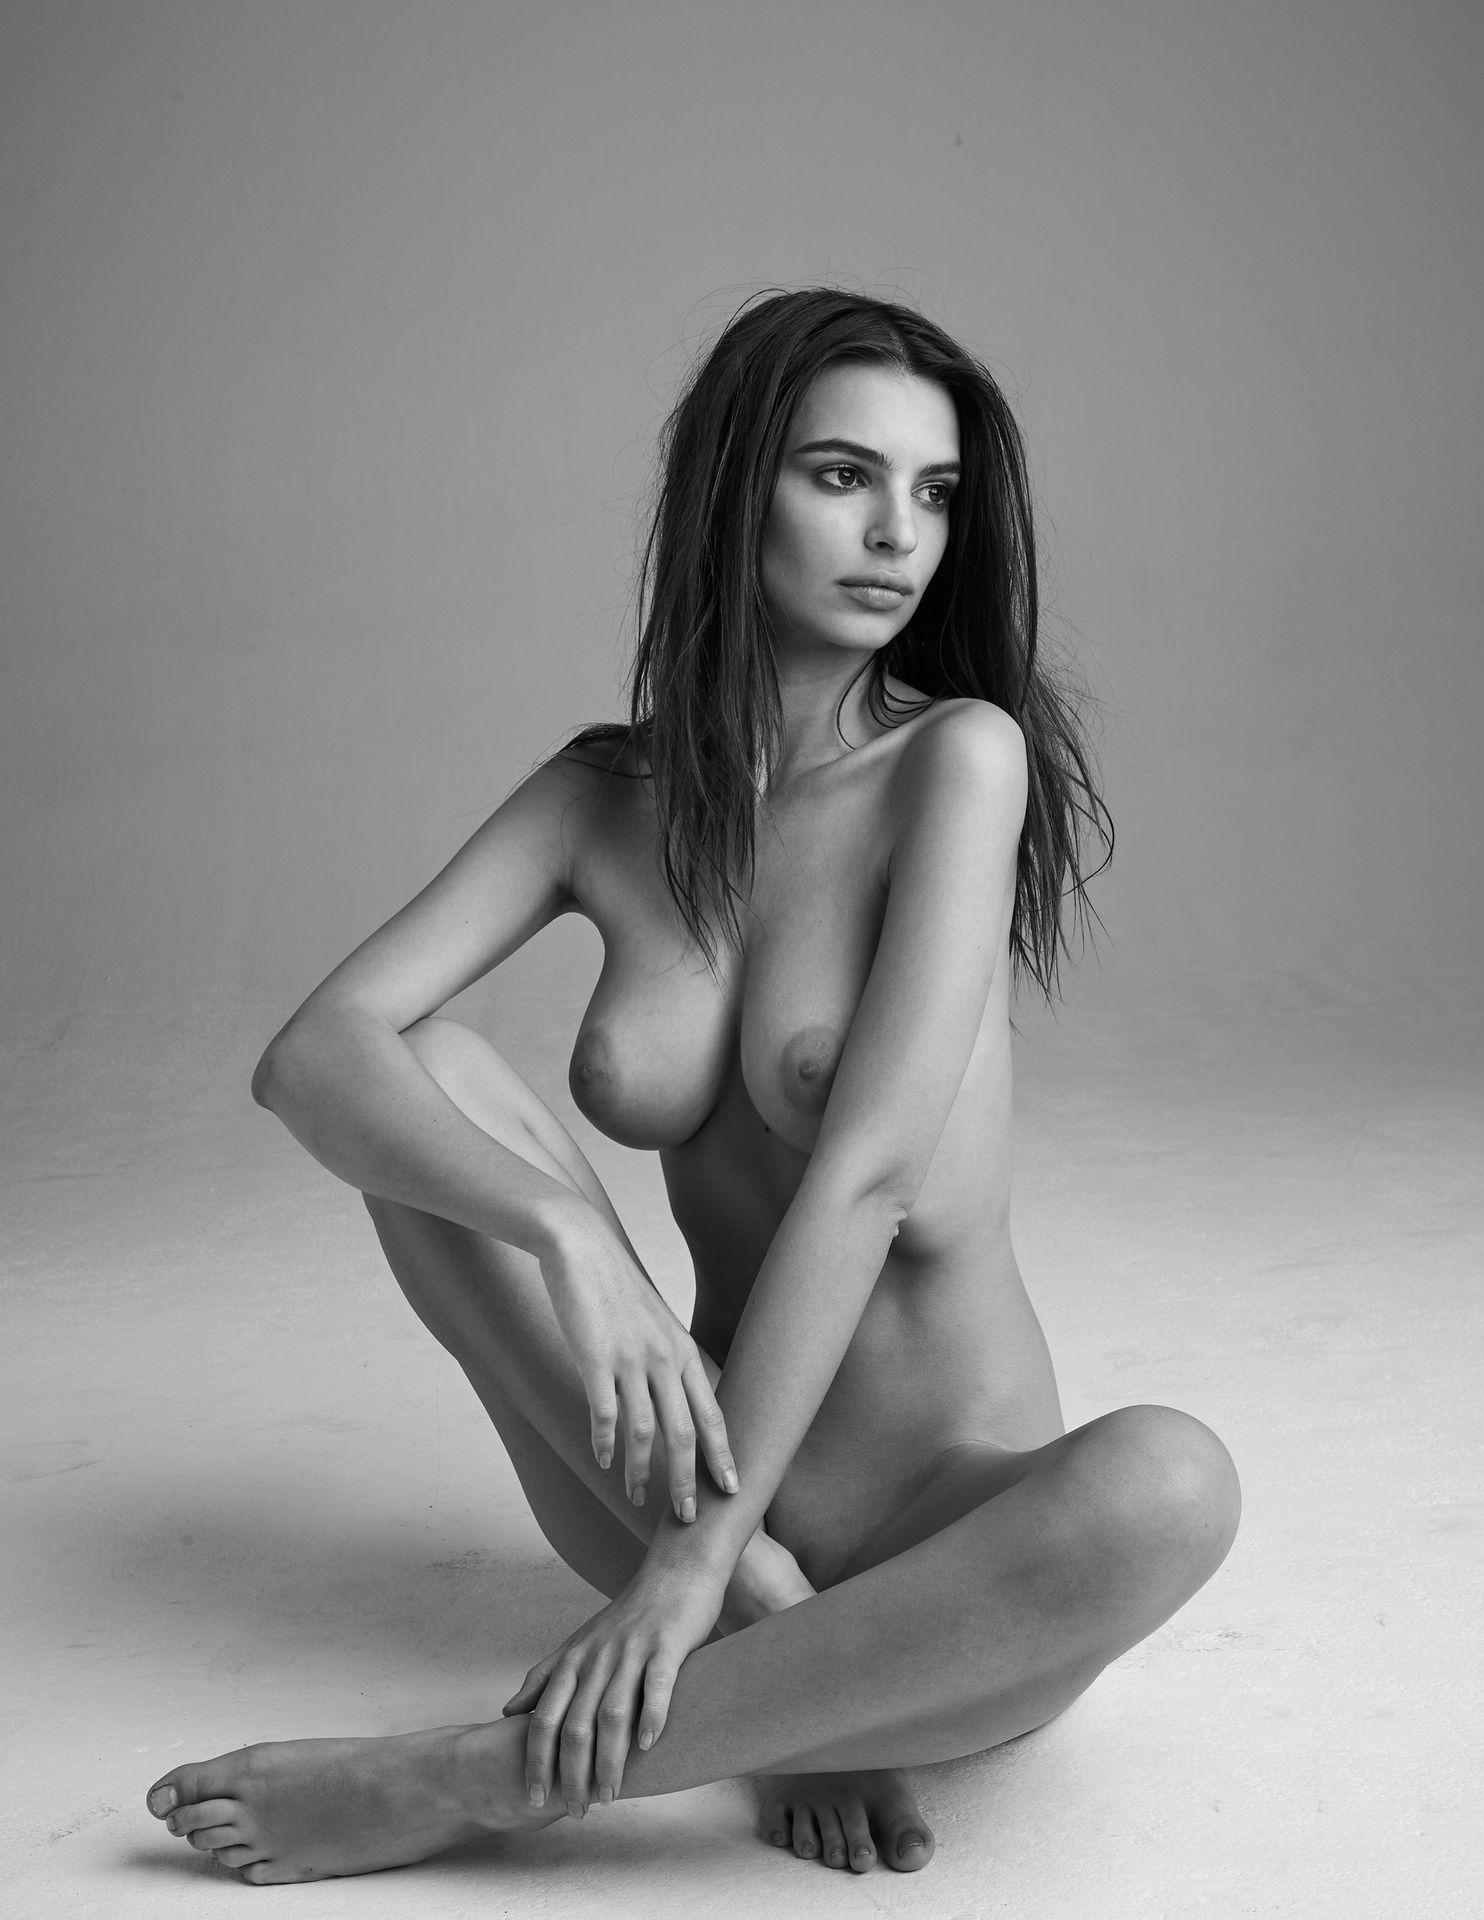 Emily-Ratajkowski-Nude-13-thefappeningblog.com_.jpg